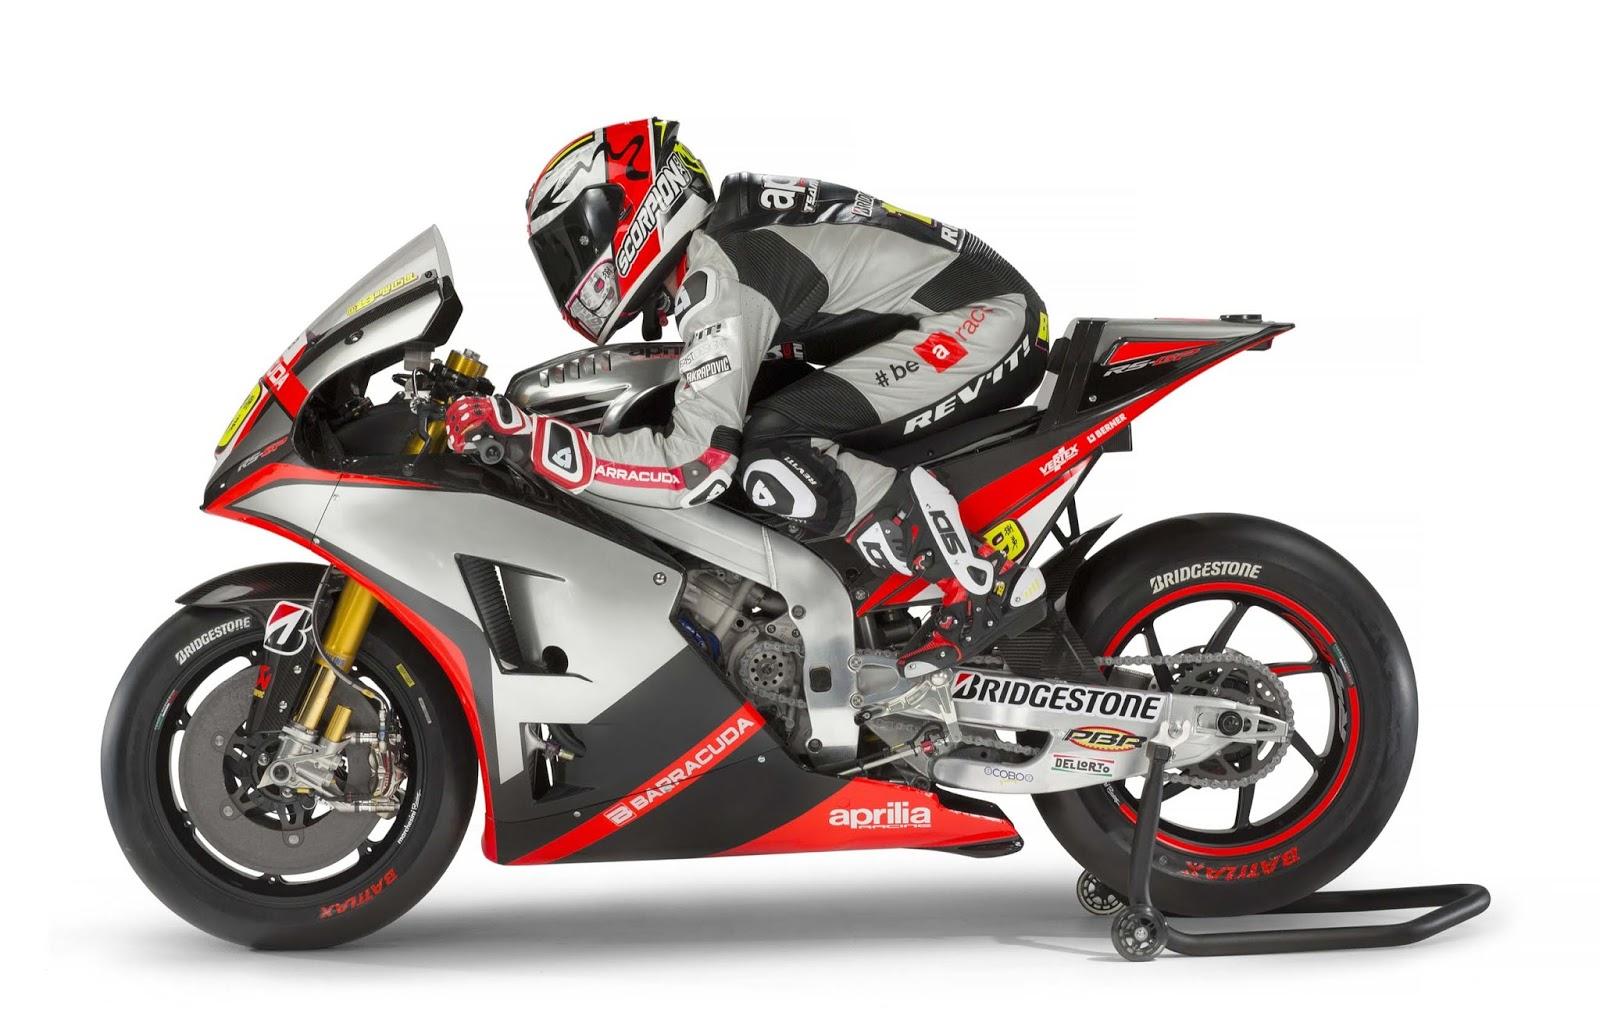 MotoGP : Ini livery tim Aprilia Gresini di MotoGP musim 2015 . . plus foto galeri